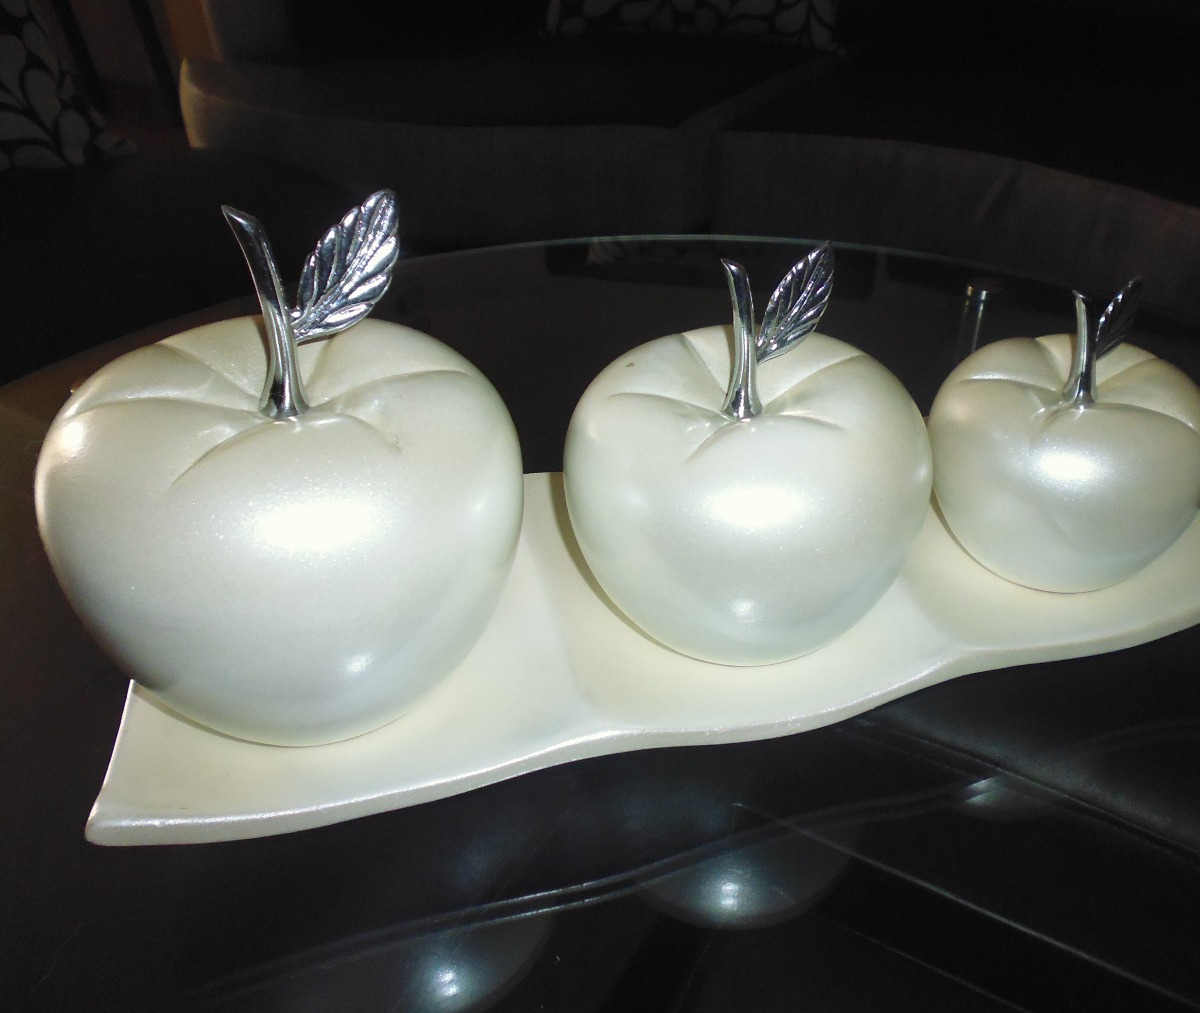 Adorno decorativo manzanas 3 u perla con base ceramica - Ceramica decoracion ...